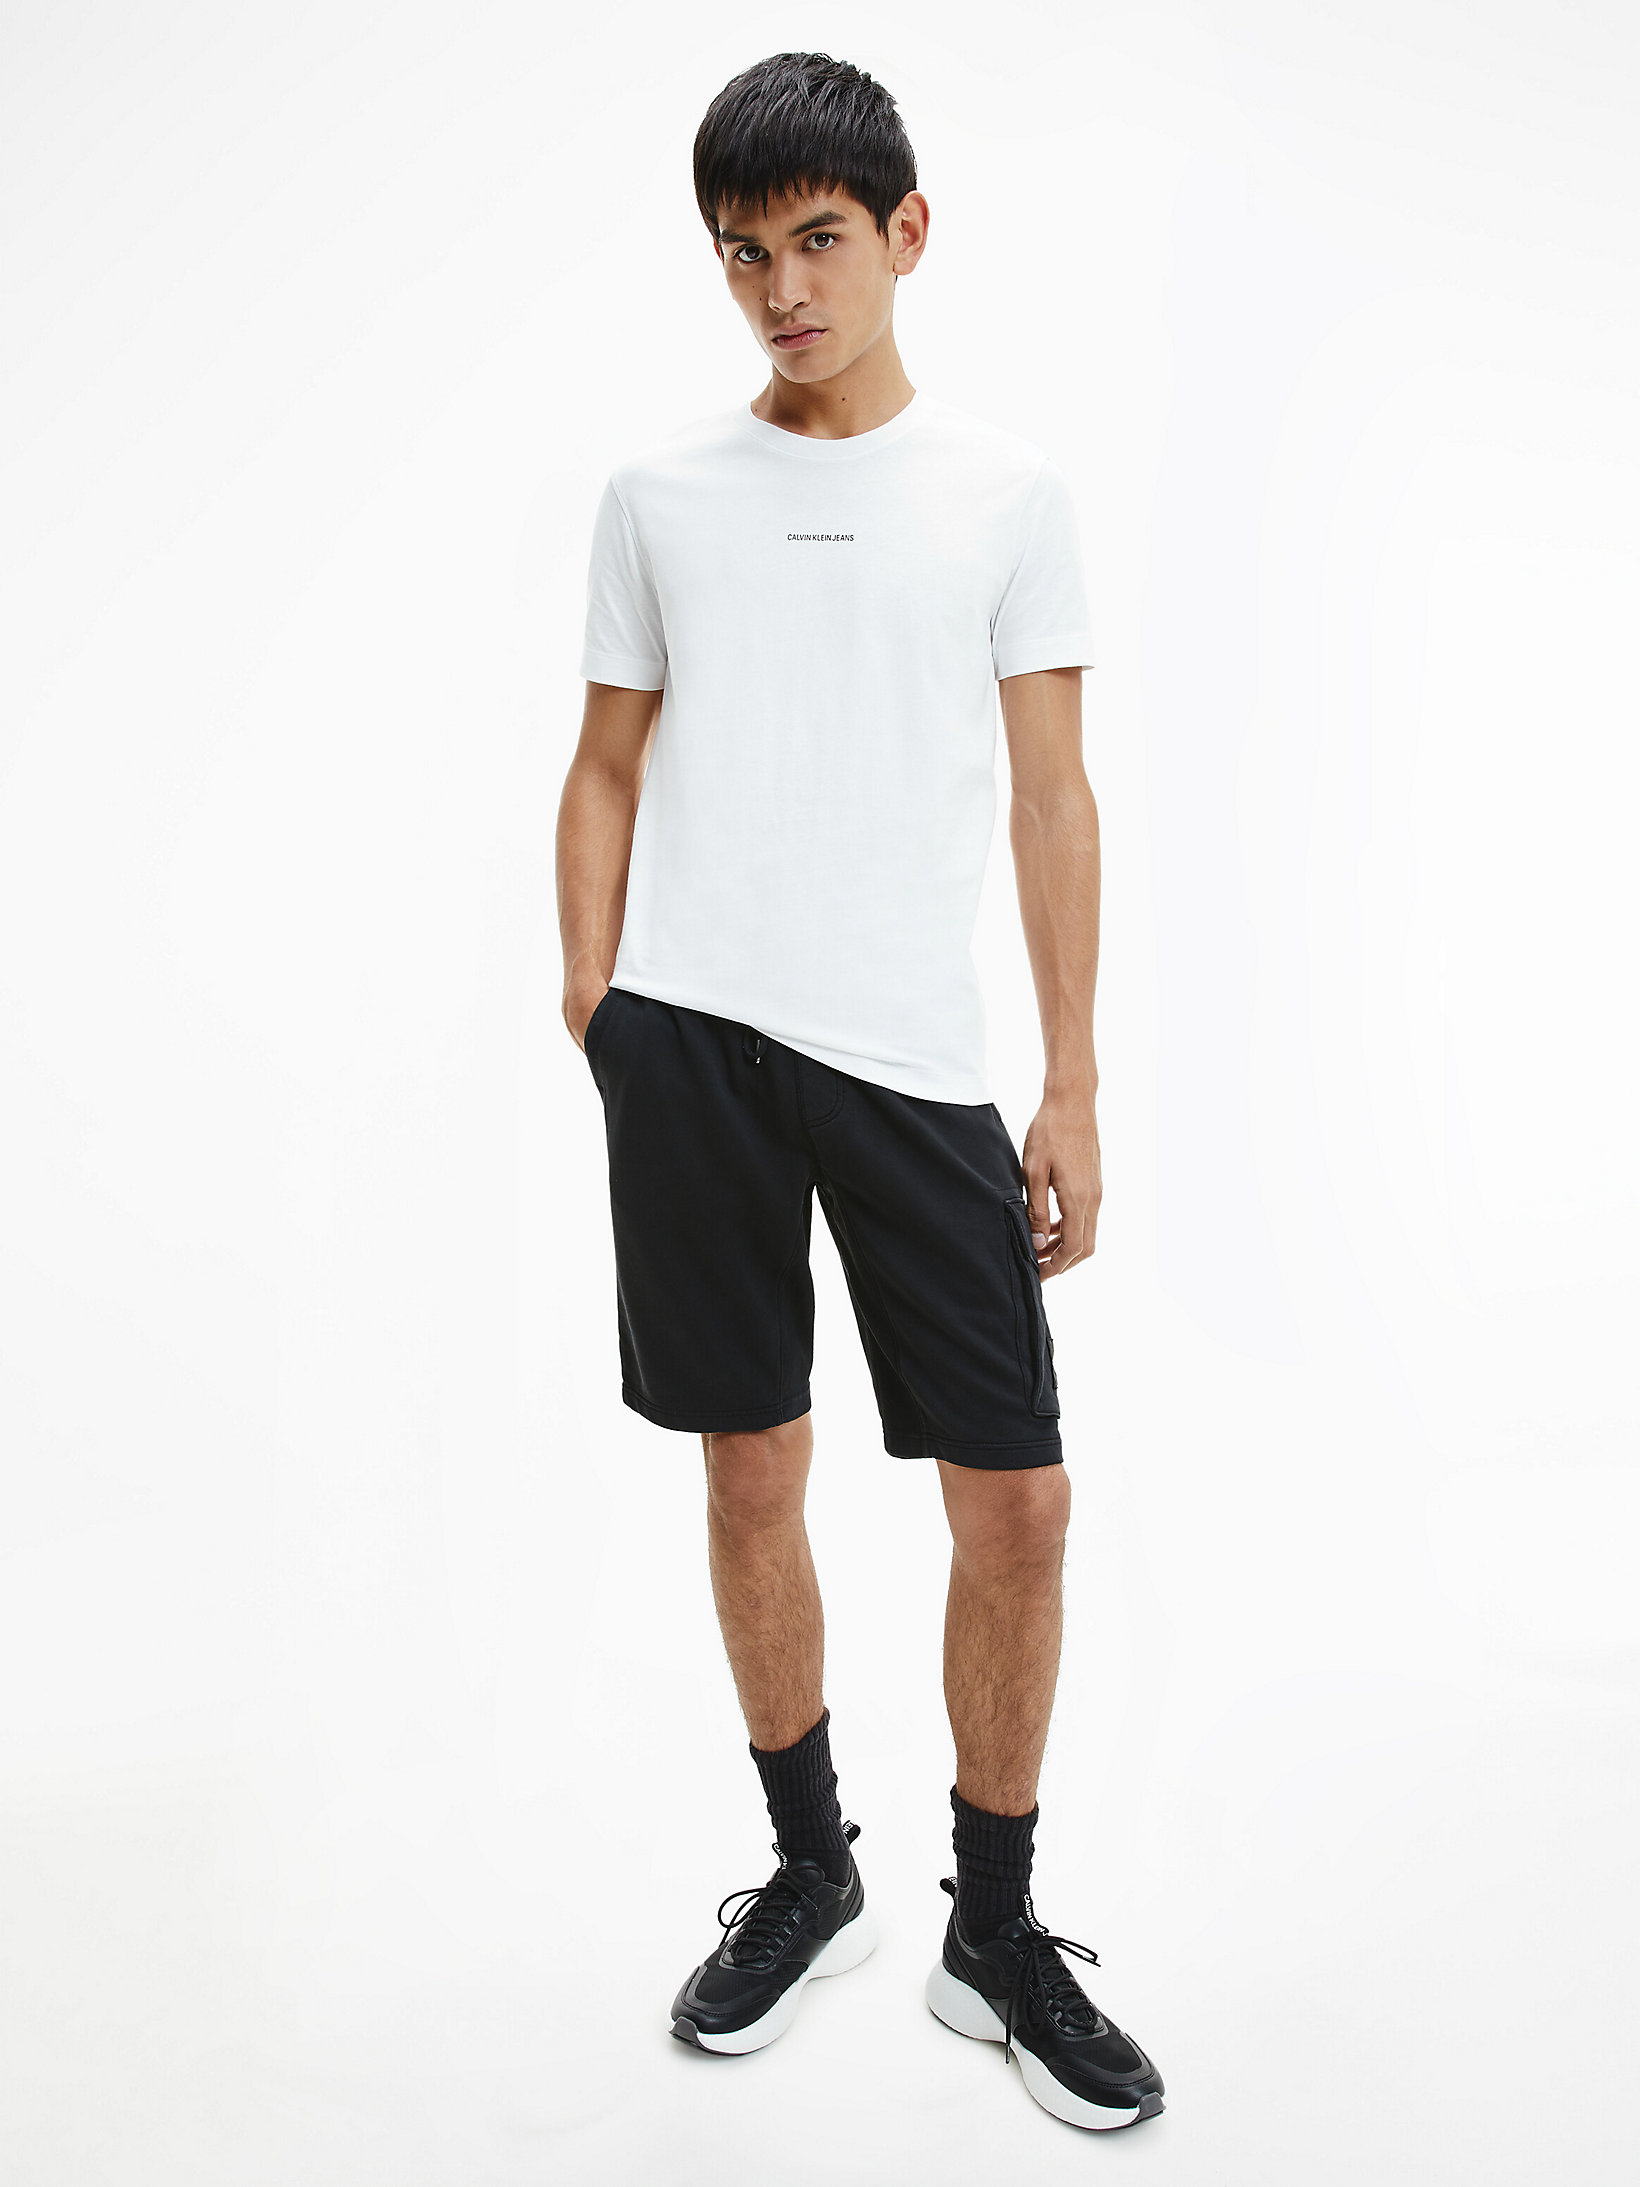 Calvin Klein Micro Branding T-shirt Bright White